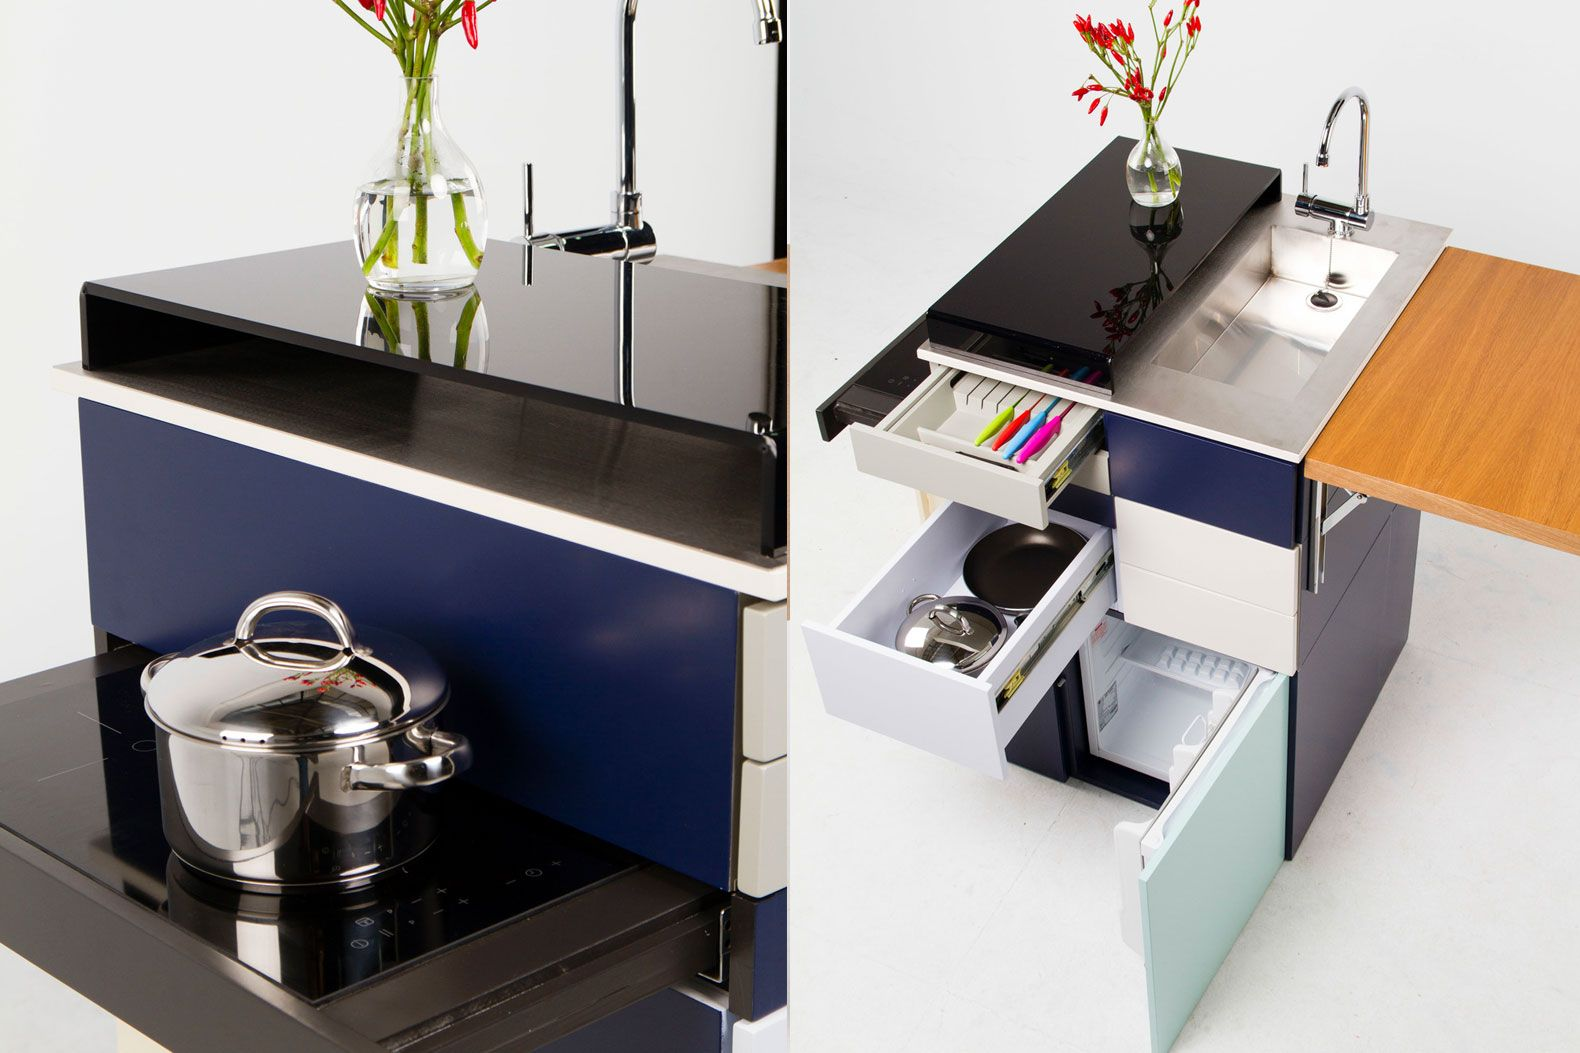 Great Ana Arana, Gali, Gali Kitchen, Gali Kitchen System, Micro Kitchen, Small